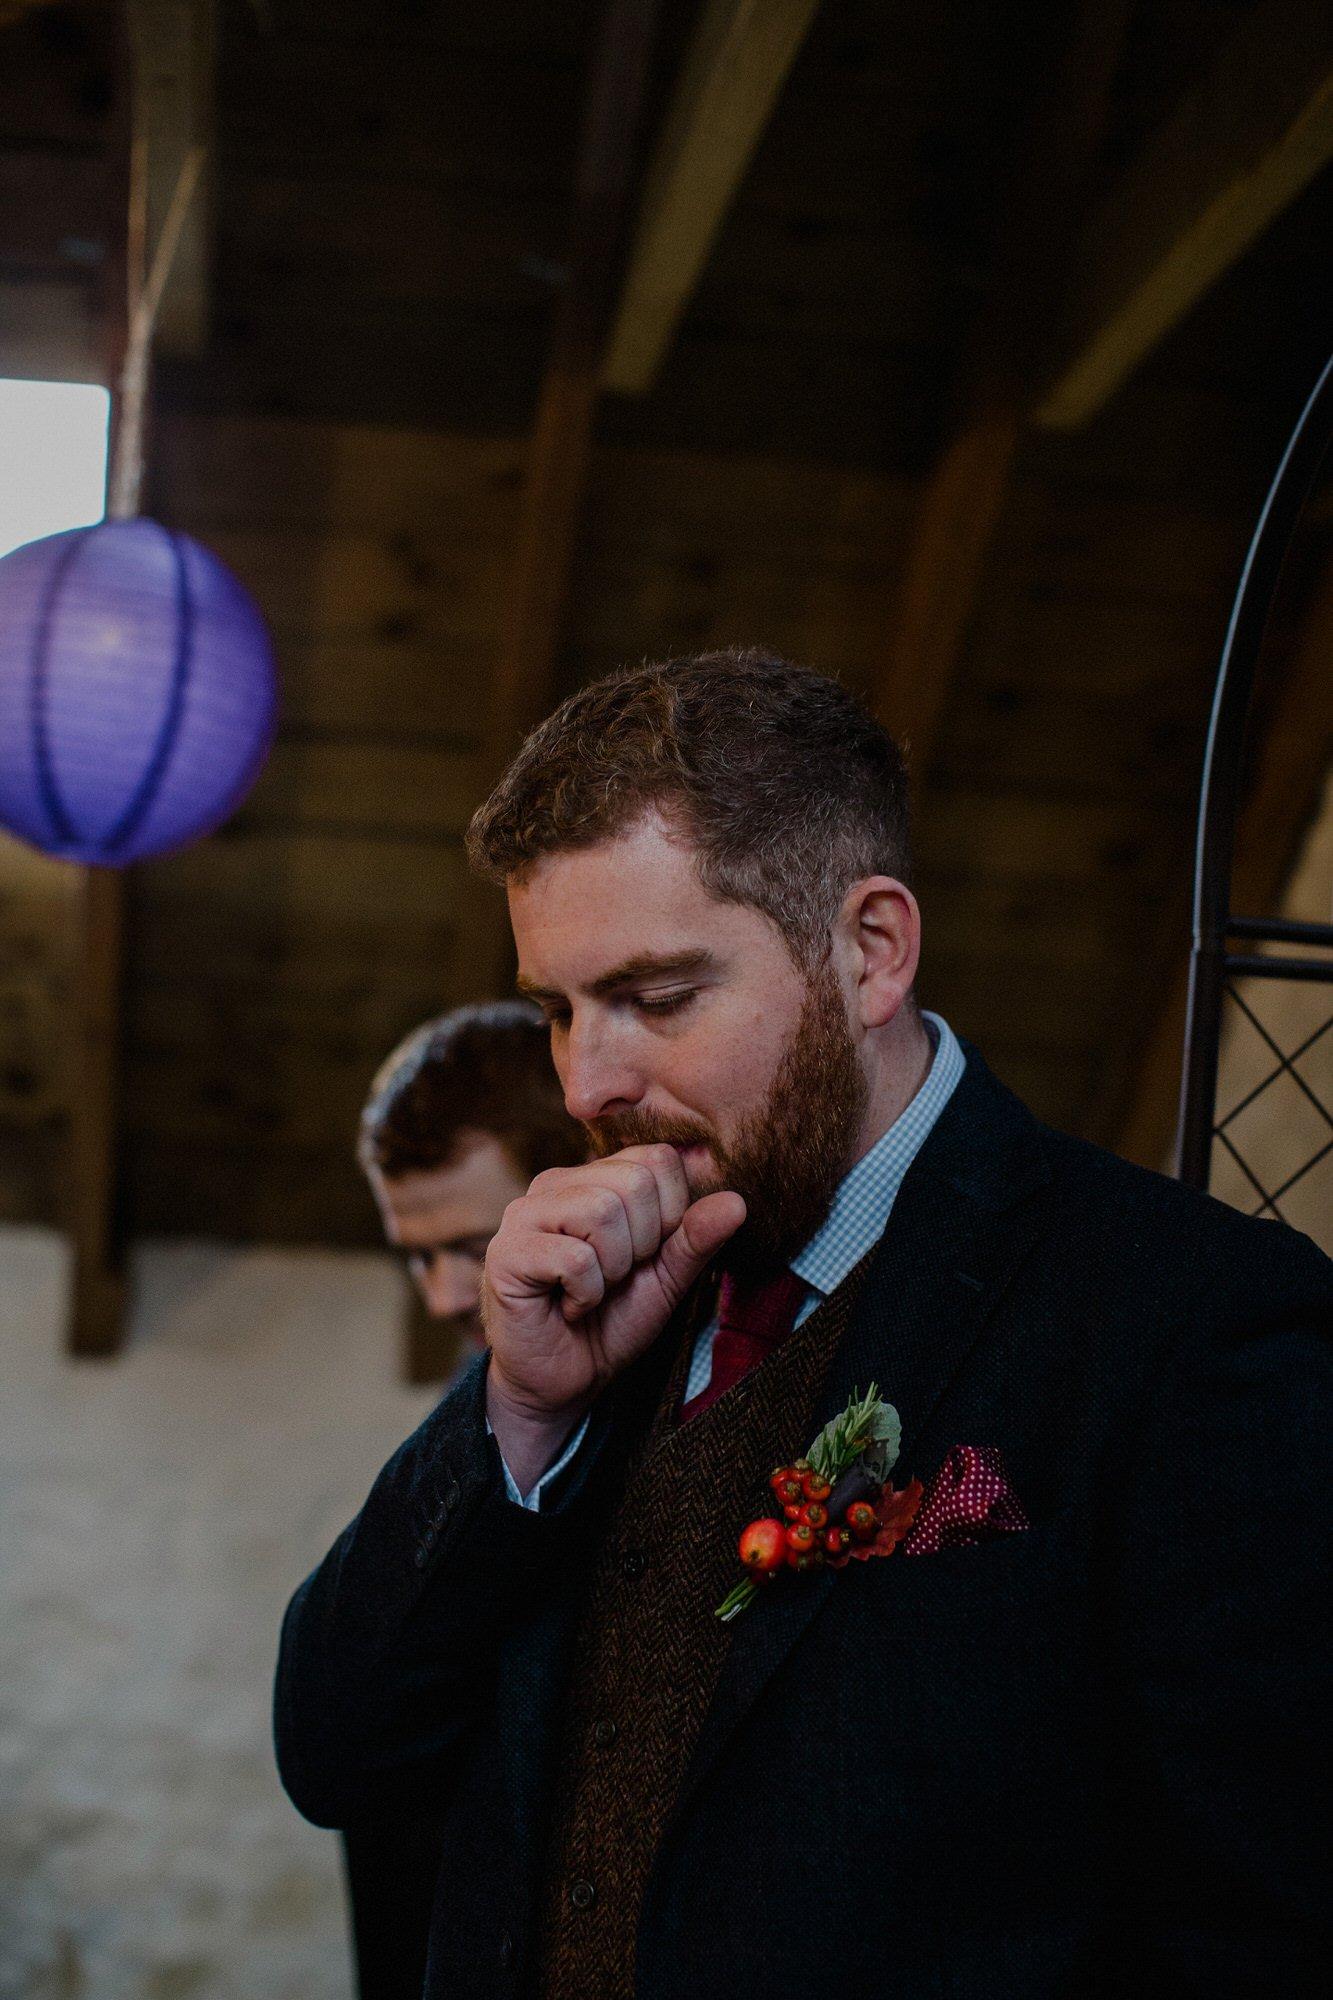 019 TIN SHED KNOCKRAICH FARM WEDDING ALTERNATIVE BRIDE ZOE ALEXANDRA PHOTOGRAPHY